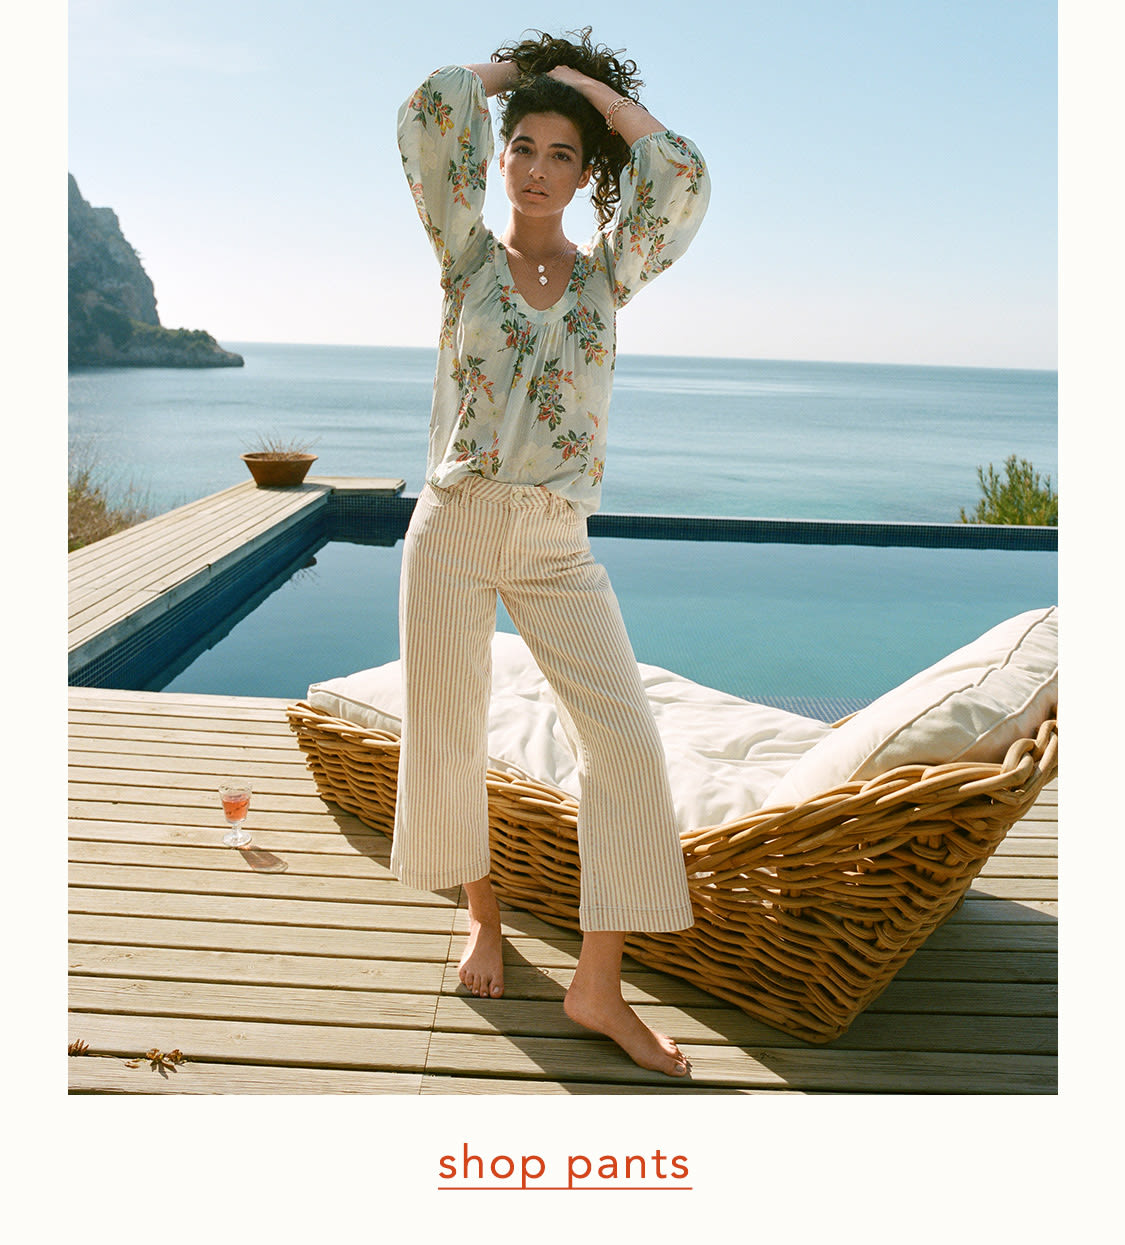 c9ae73ba558 shop pants. shop ivory outfitting. shop new accessories. shop plus clothing